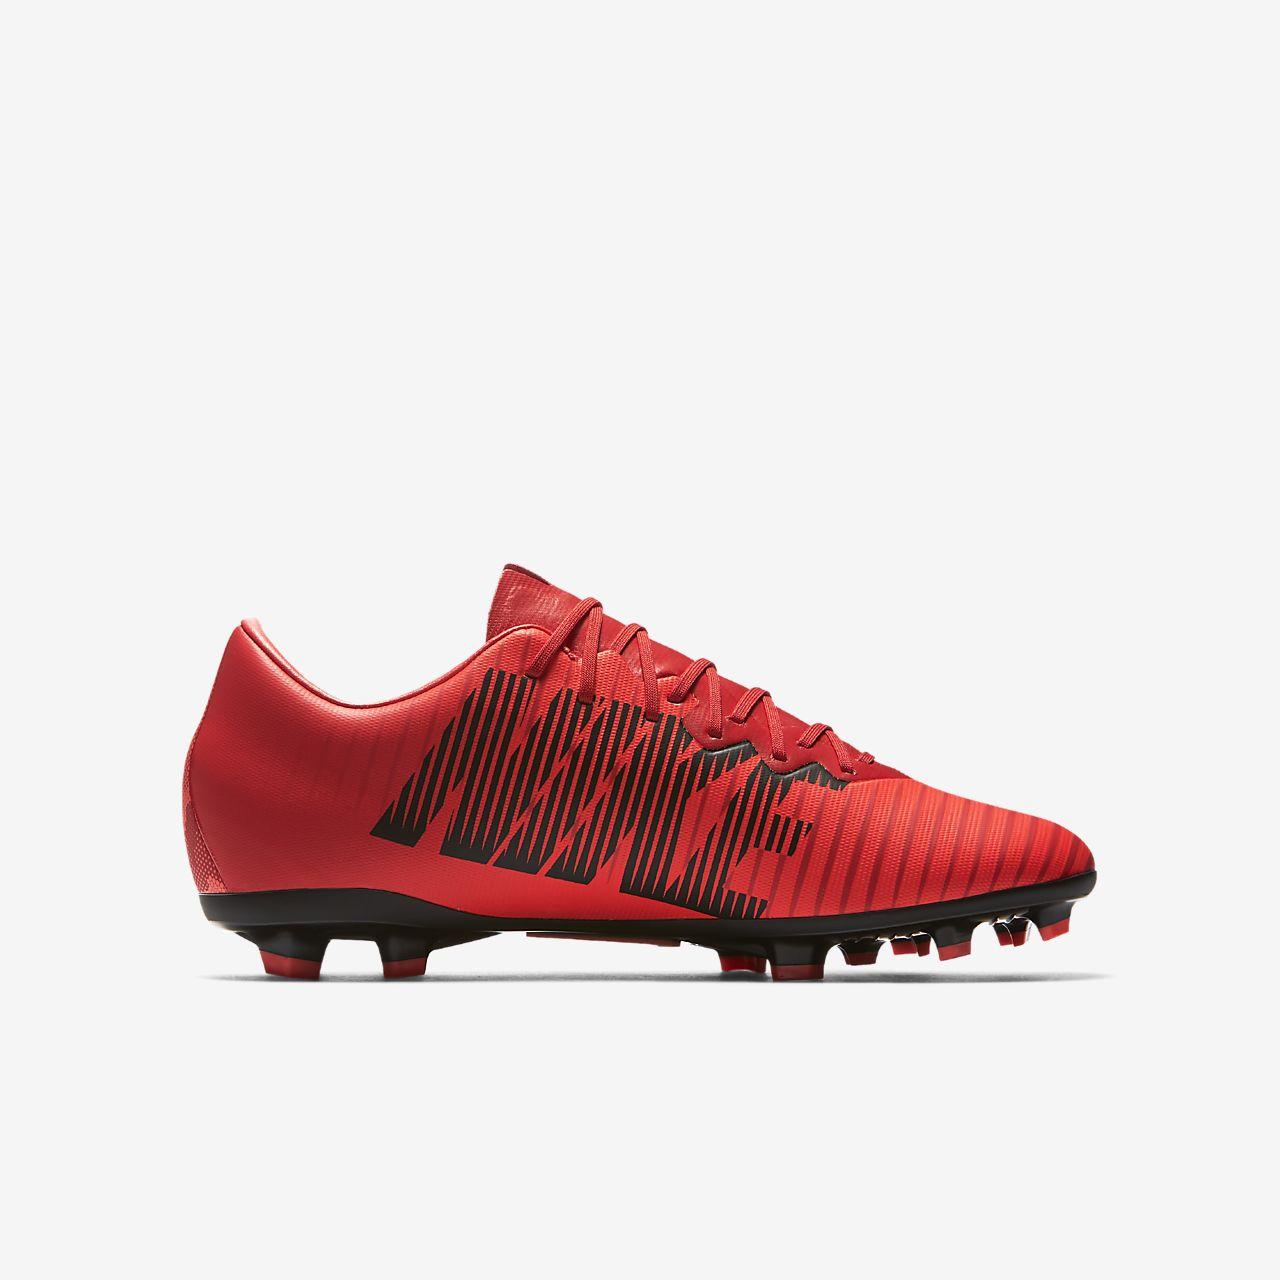 ... Nike Jr. Mercurial Vapor XI Younger/Older Kids' Firm-Ground Football  Boot